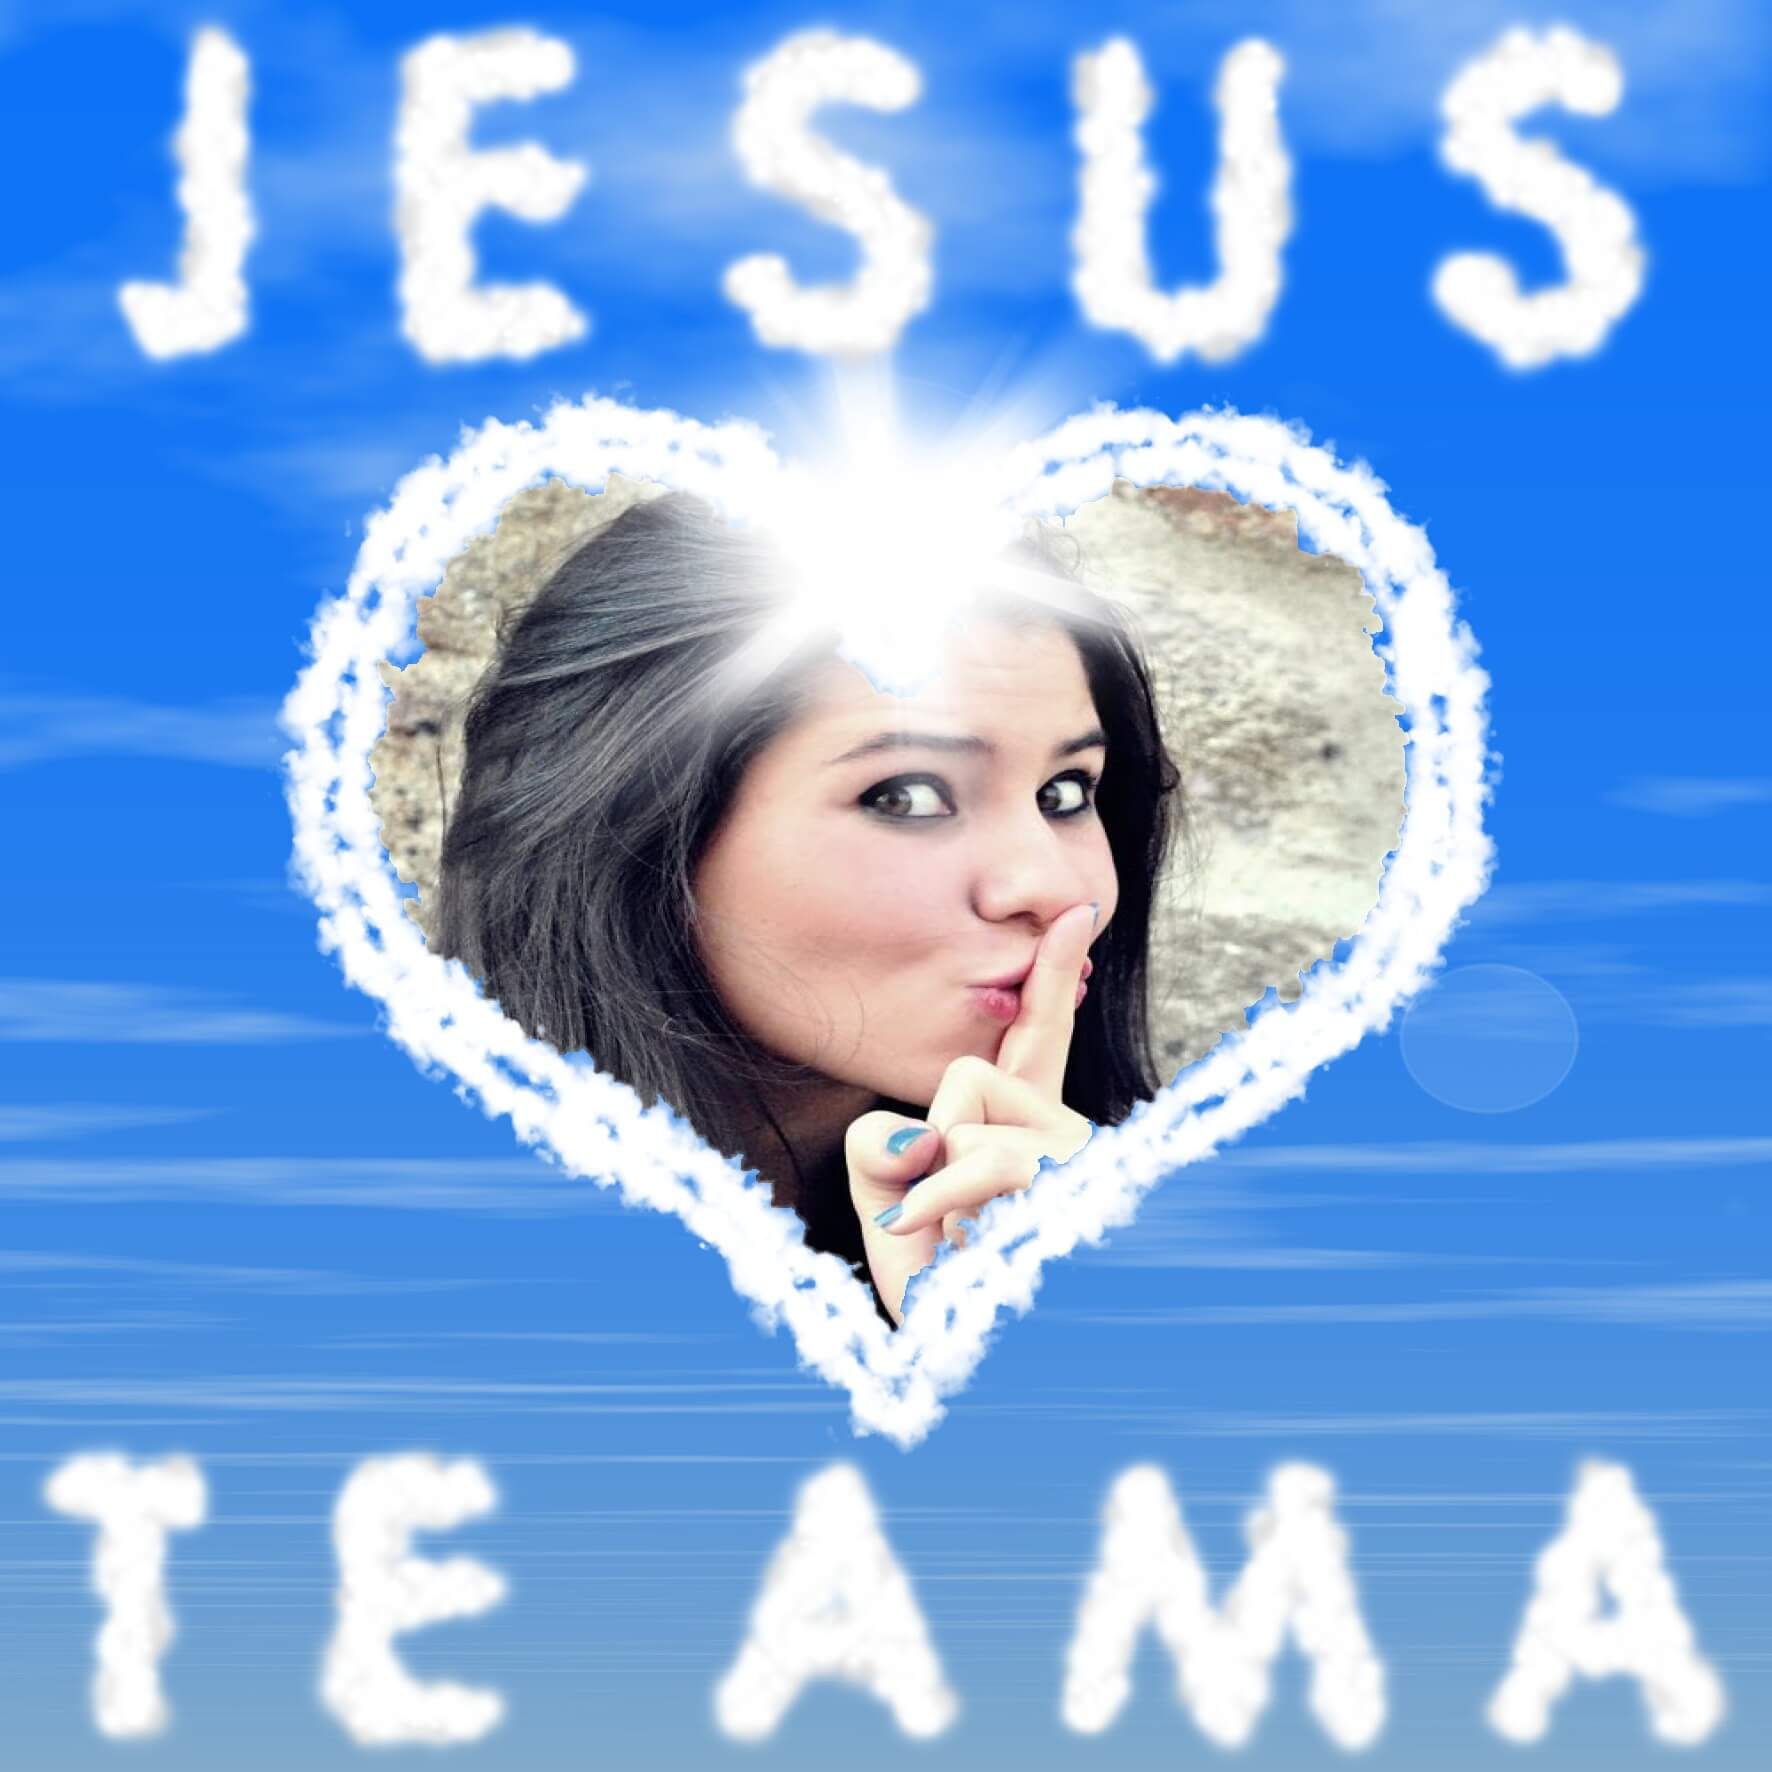 jesus-te-ama-montagem-de-foto